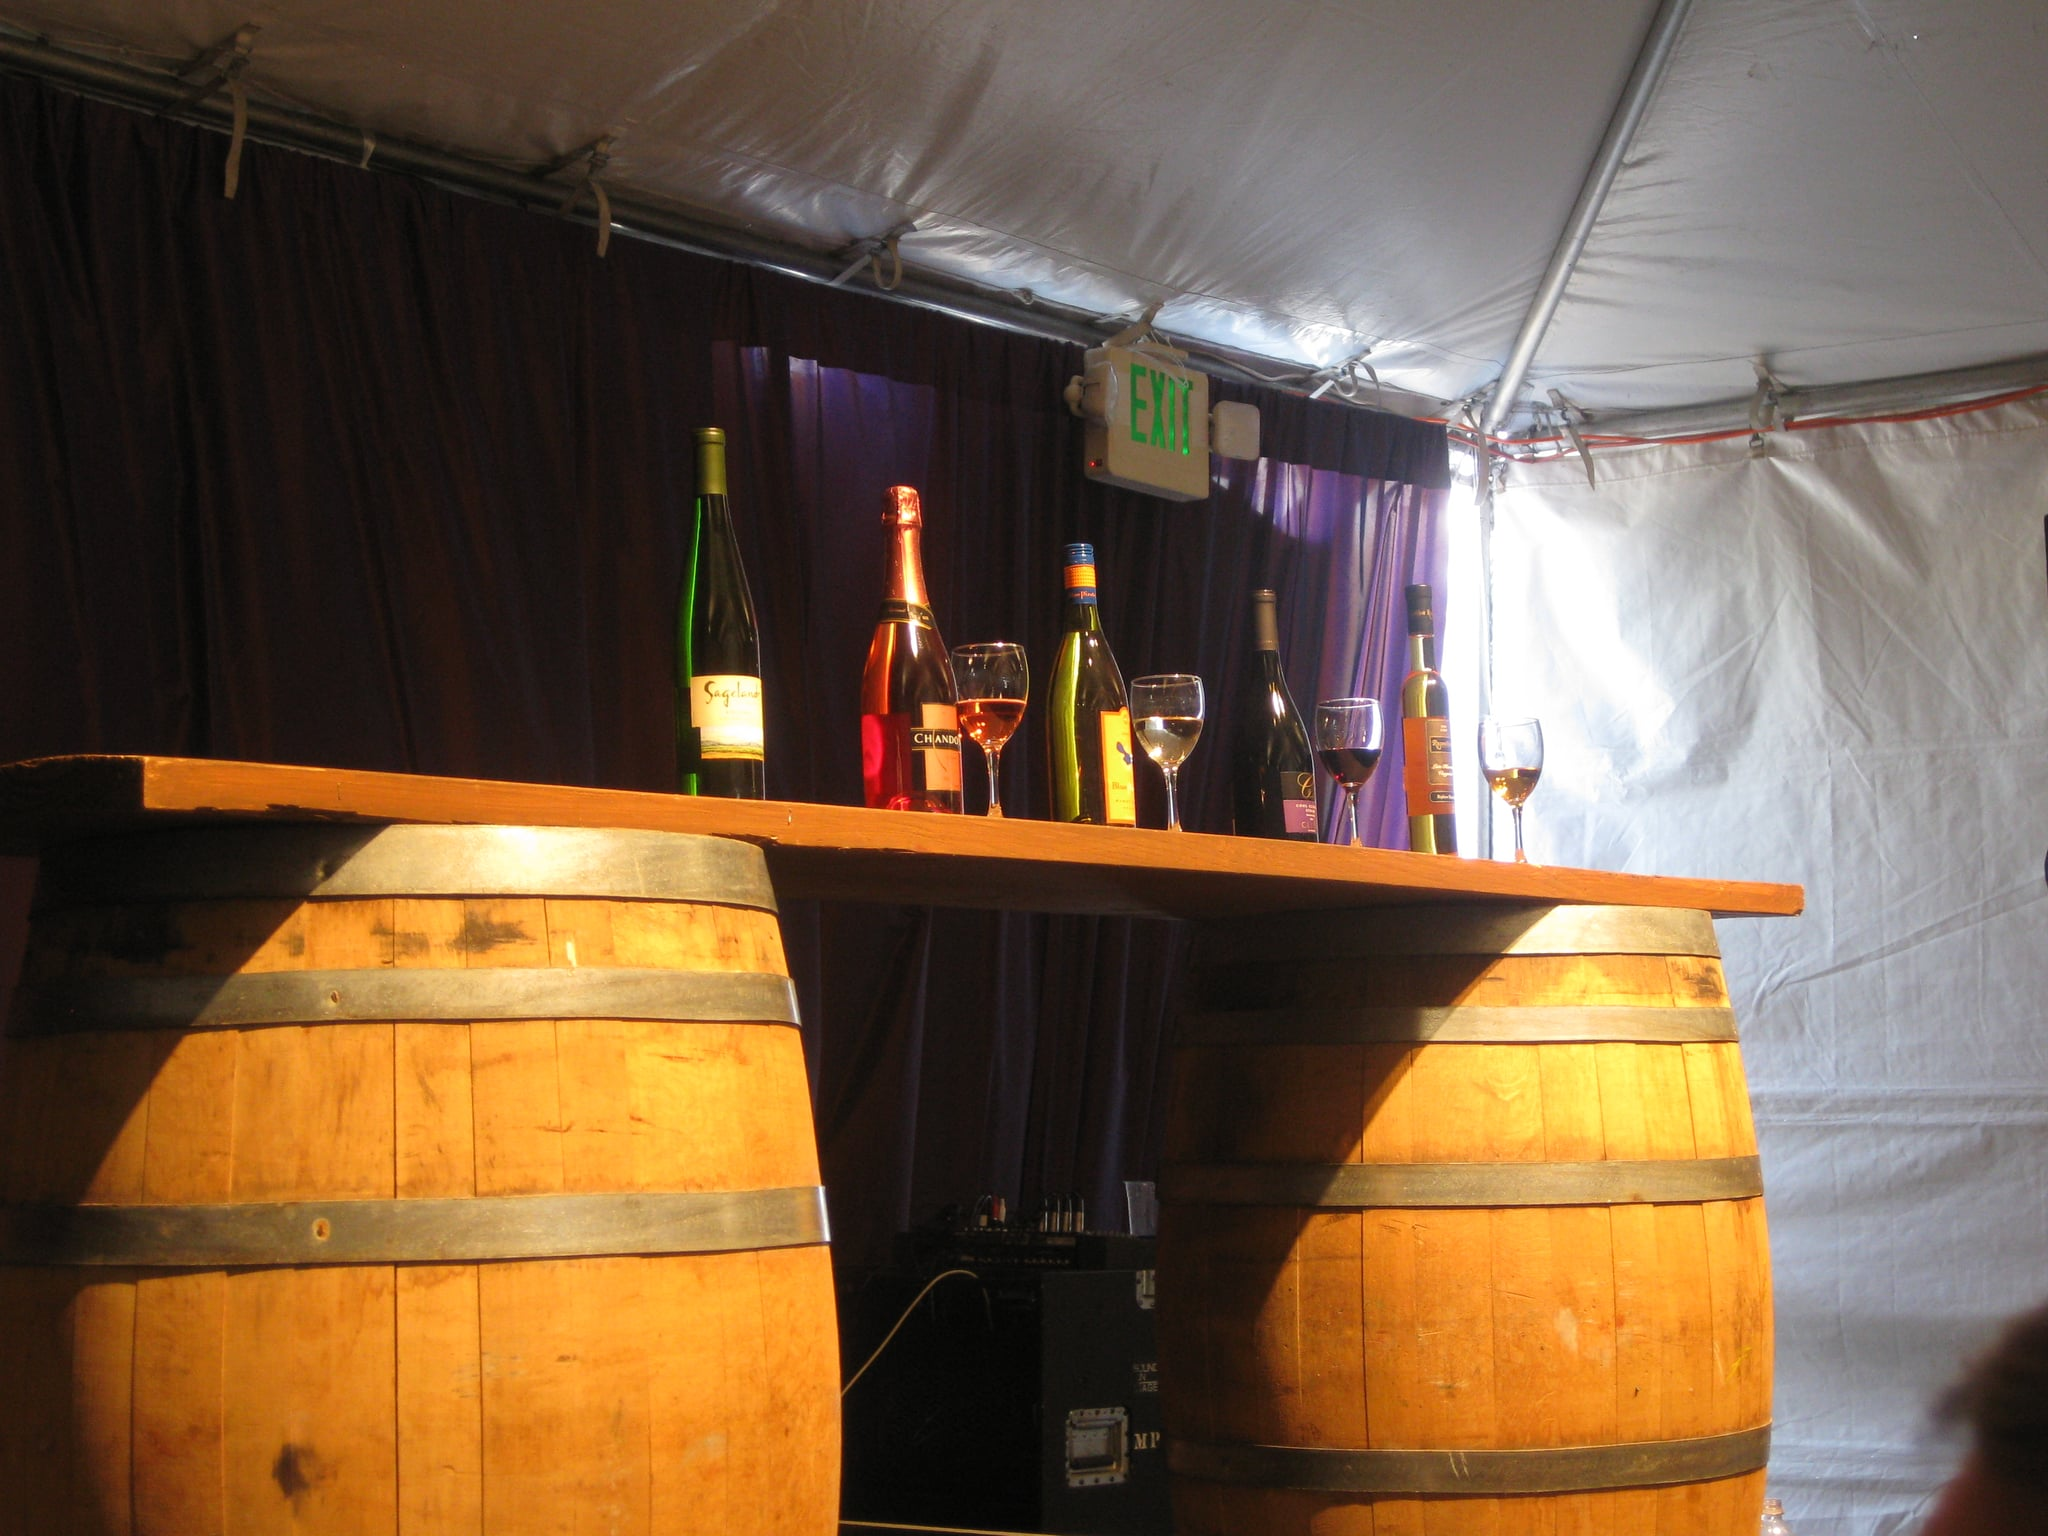 The five wines we tasted on display.